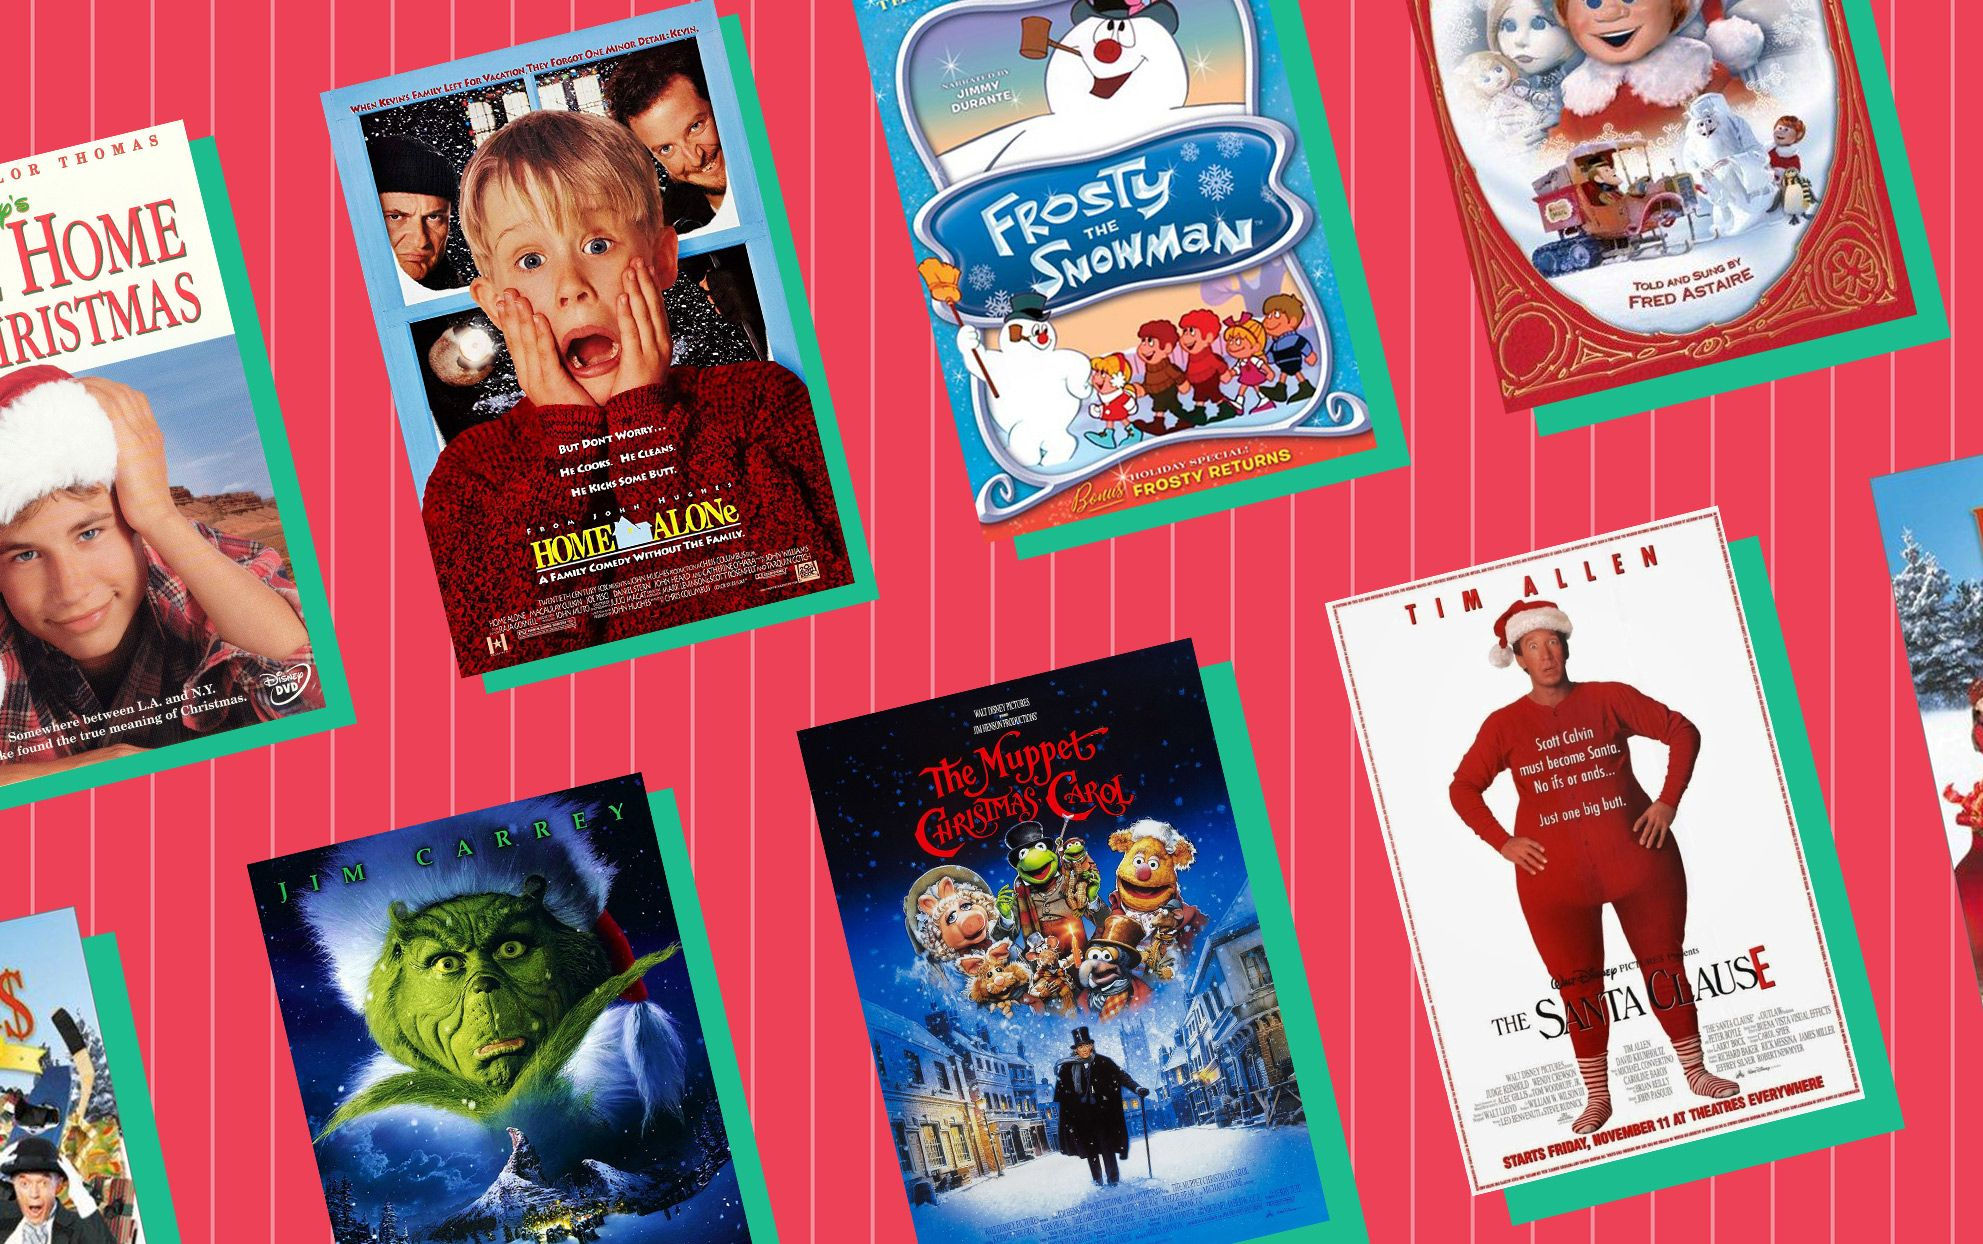 Mark Your Calendars Freeform's 25 Days of Christmas